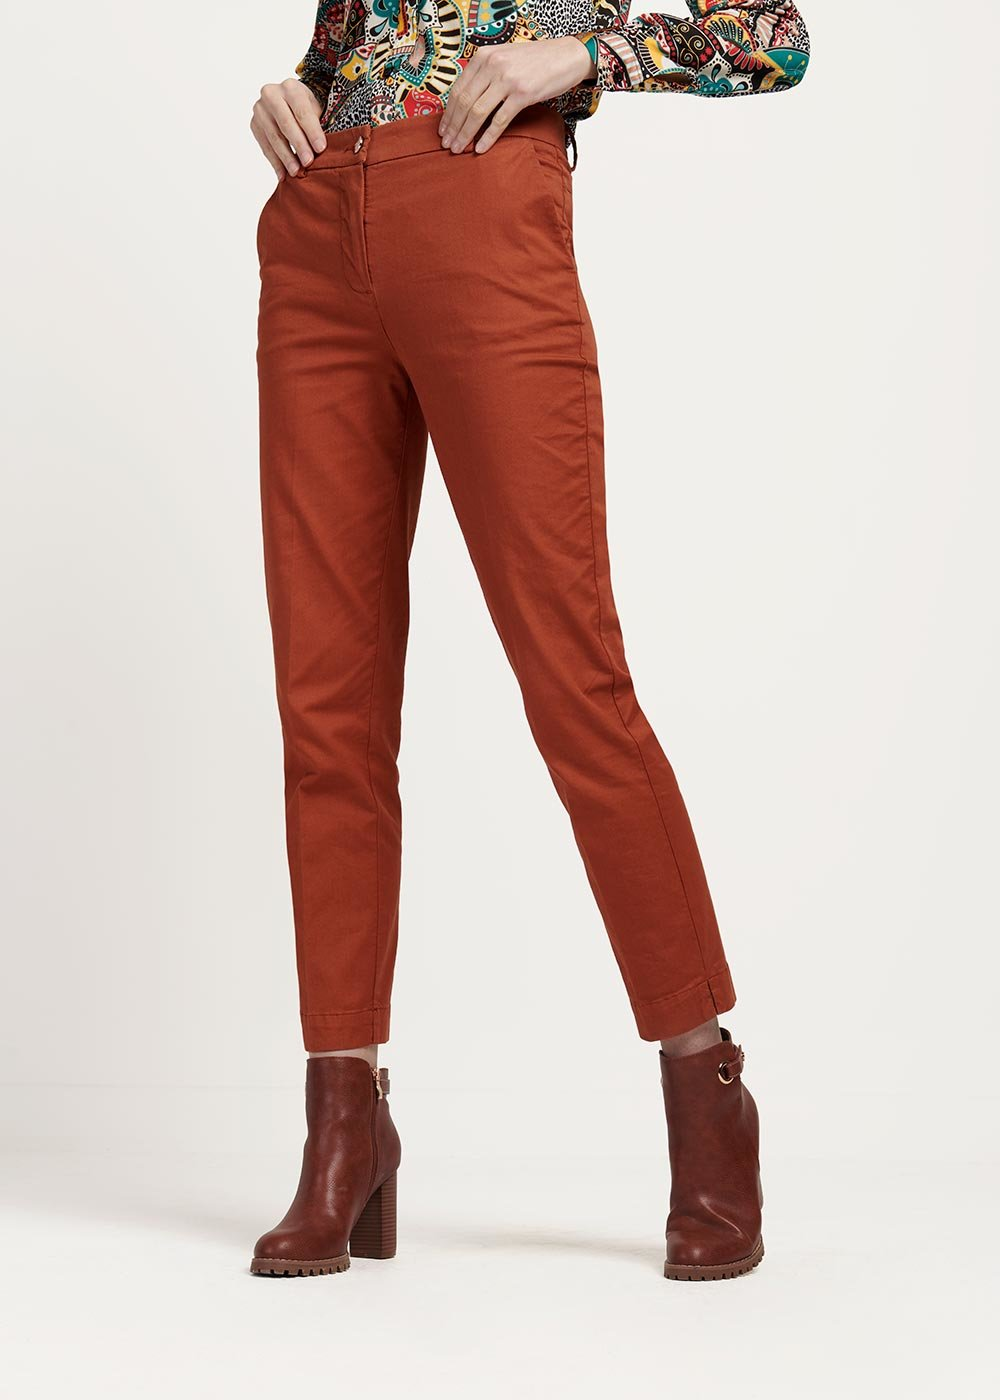 cinnamon-coloured Alice trousers - Cinnamon - Woman